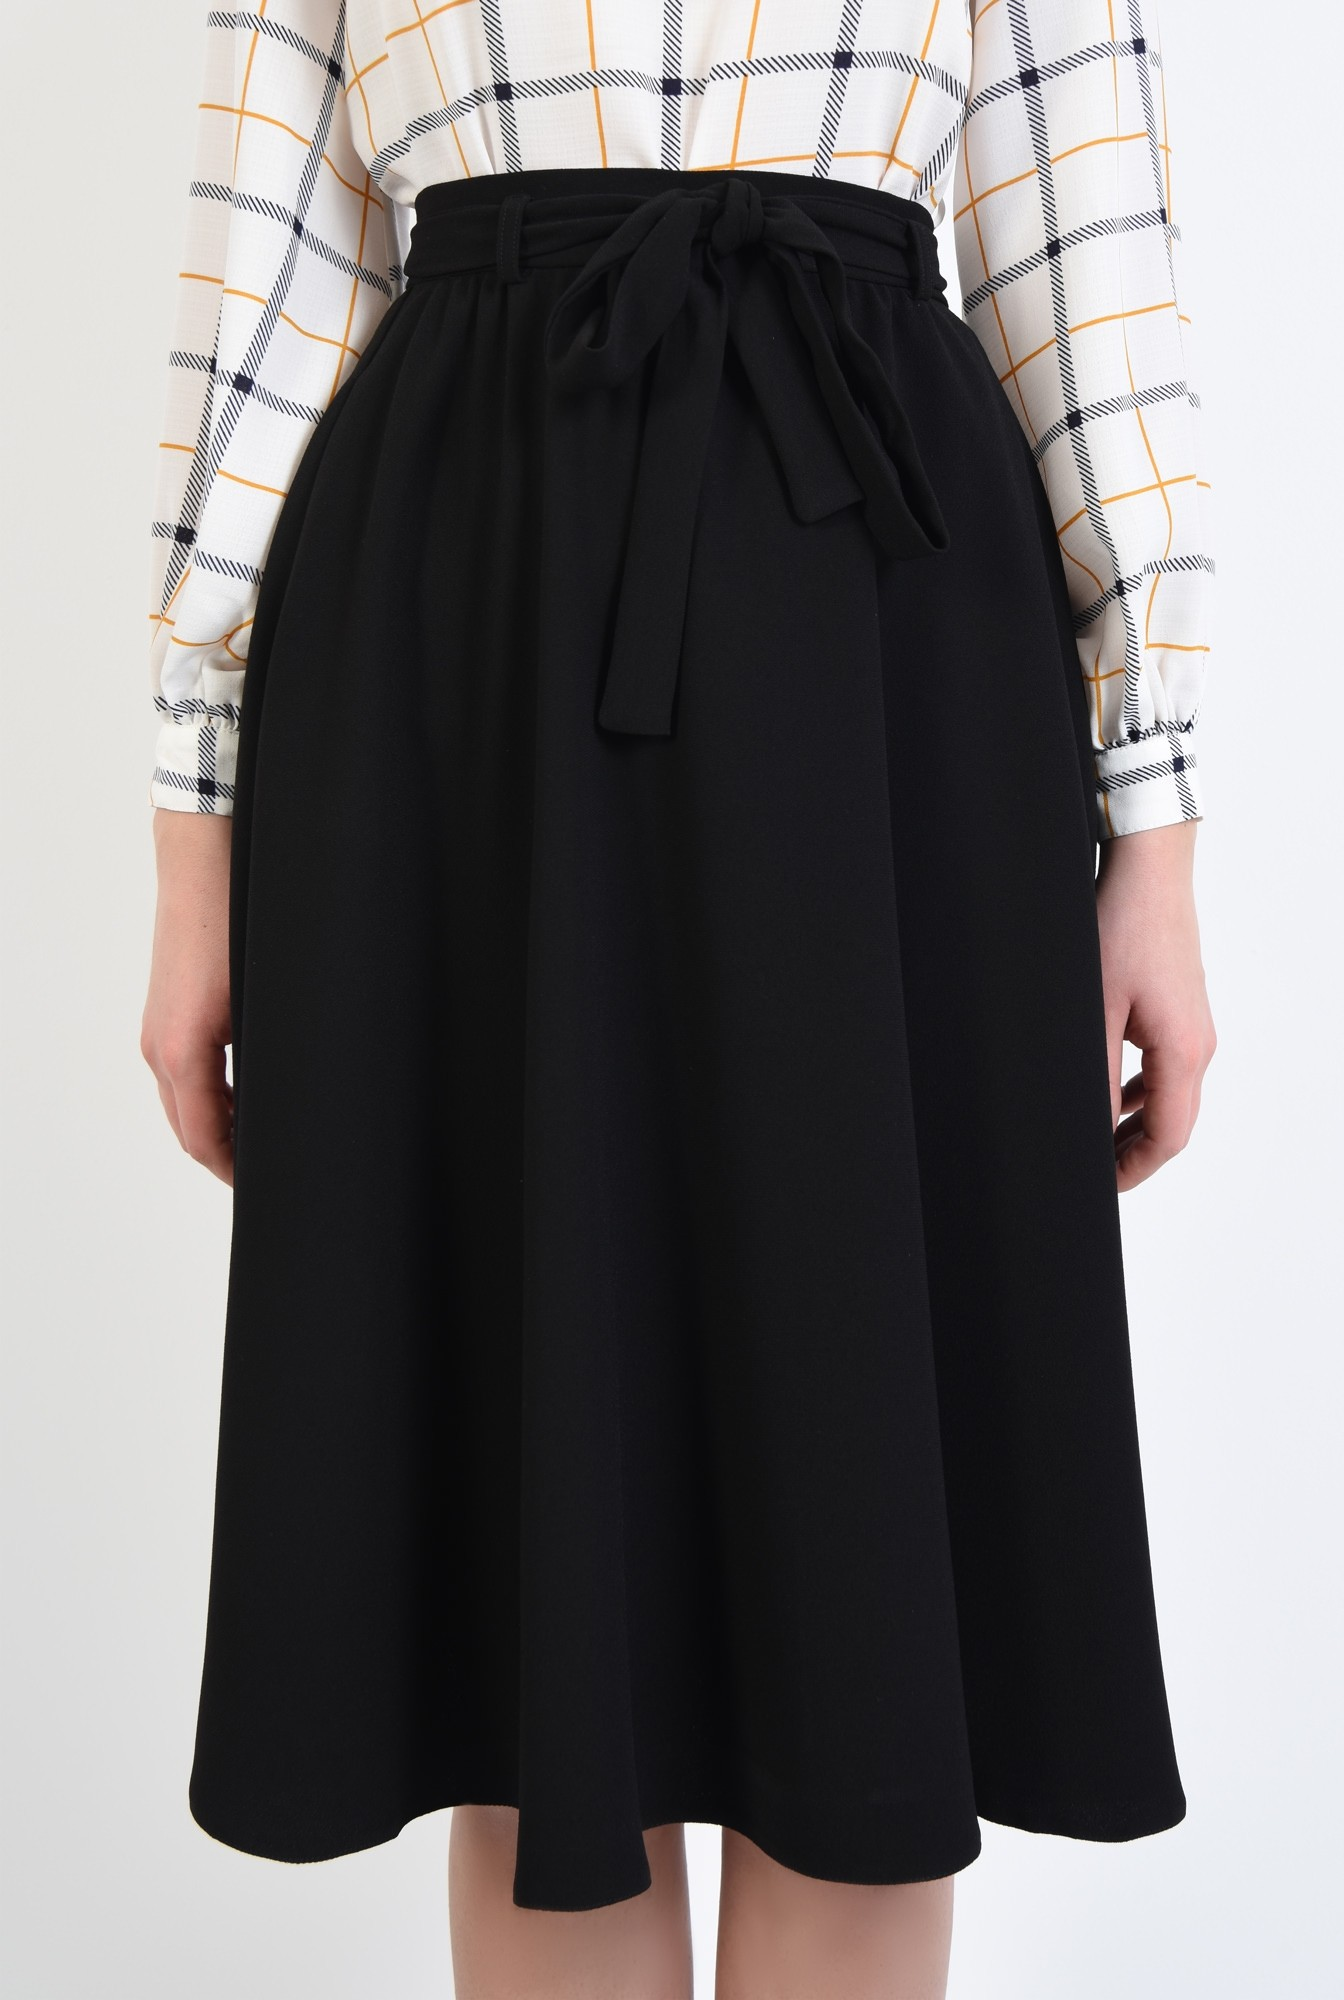 2 - fusta neagra, evazata, cu funda, croi pe bie